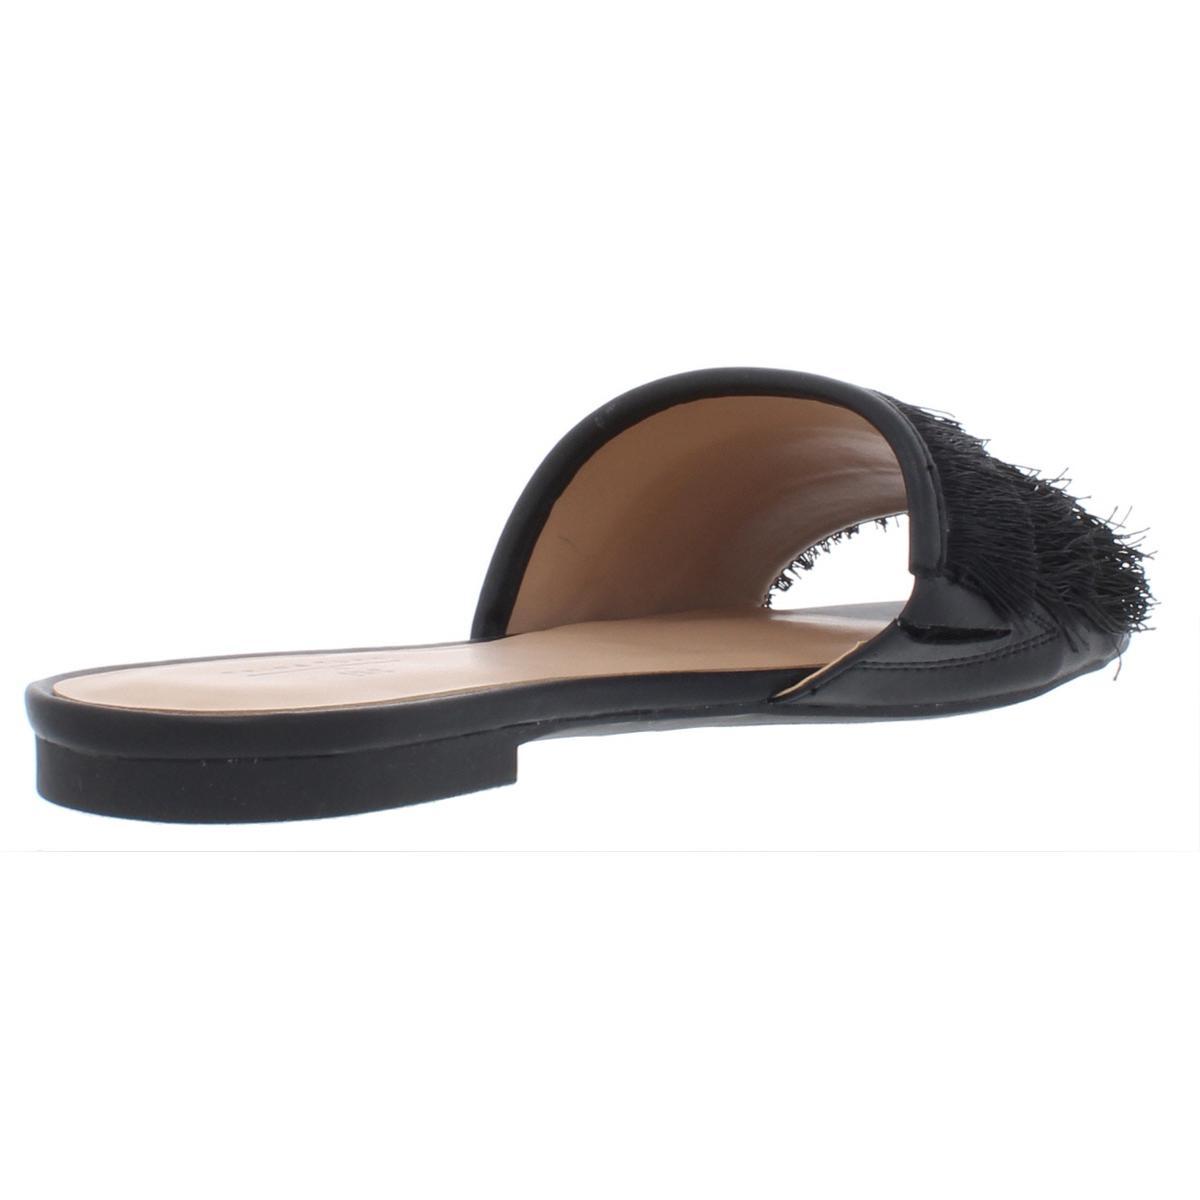 INC-Womens-Maira-Satin-Slides-Embroidered-Flats-Sandals-BHFO-6355 thumbnail 4